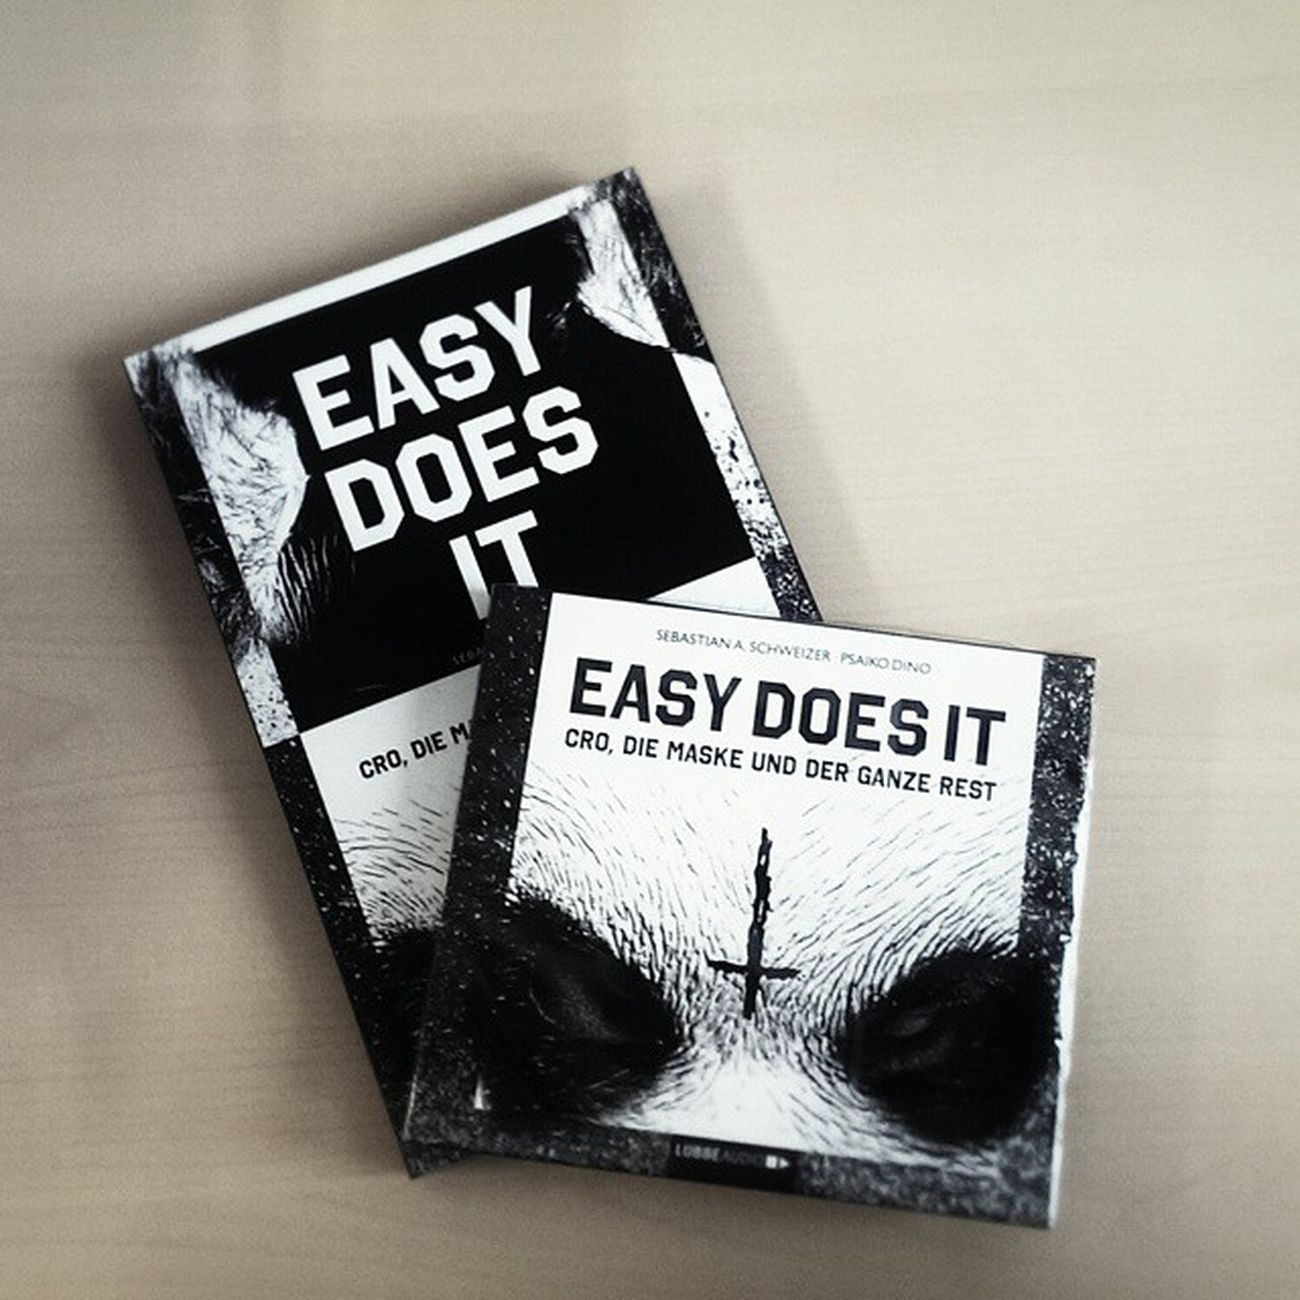 Easy does it! Chimperator Cro Psaikodino Stuttgart 0711 Berlin releaseday stuggi hiphoplebt hiphop Musik music Rap Bw